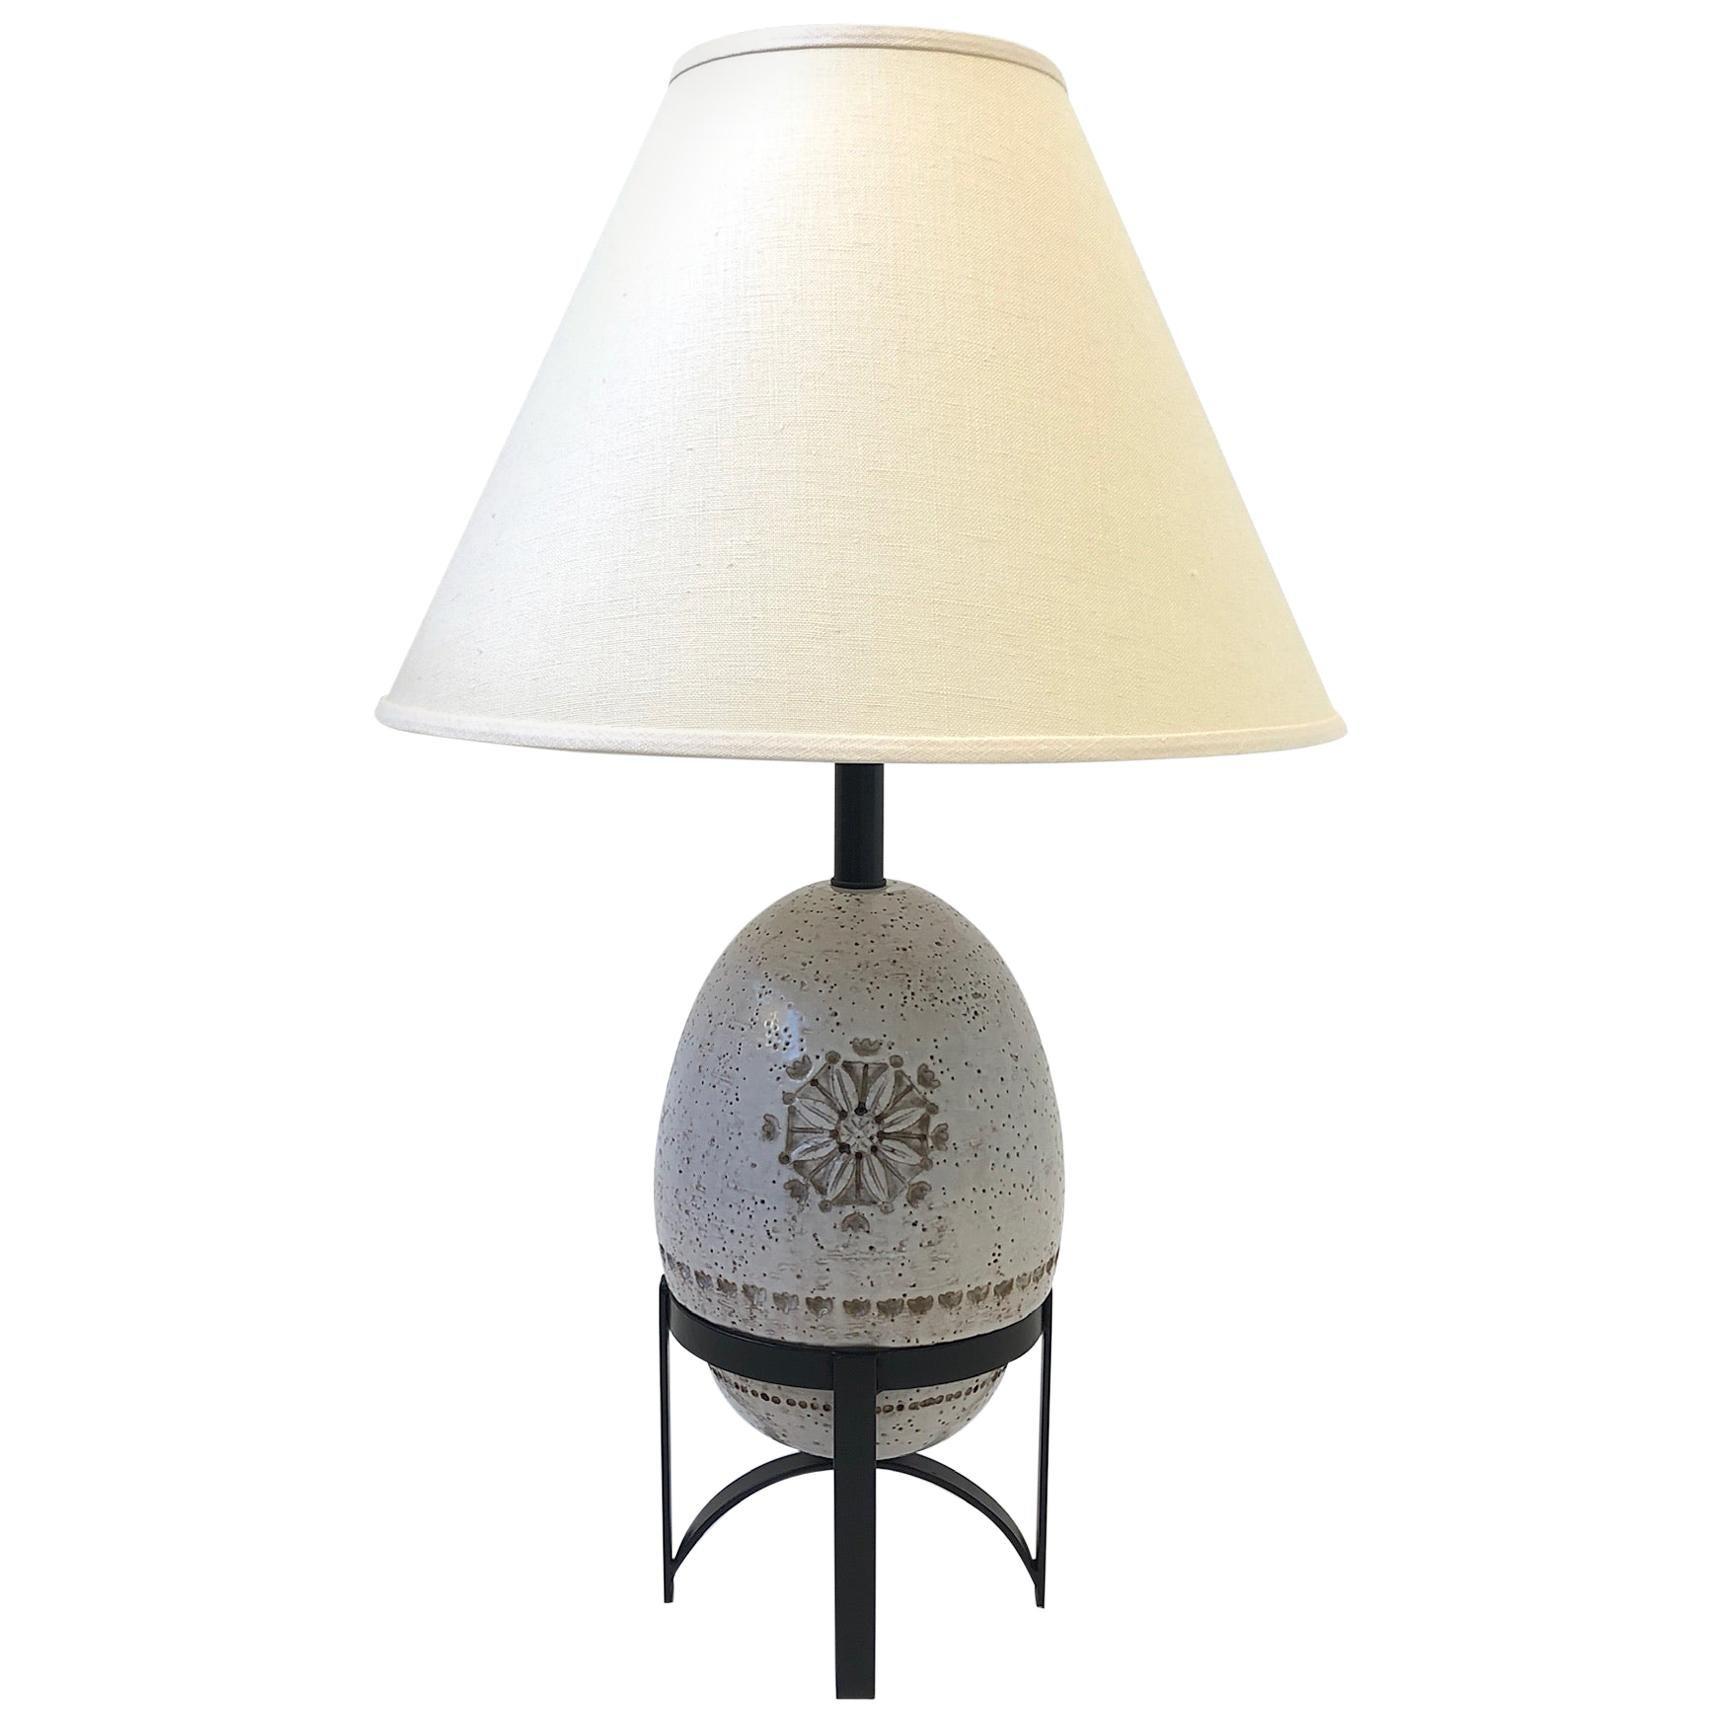 White Italian Ceramic Table Lamp by Bitossi